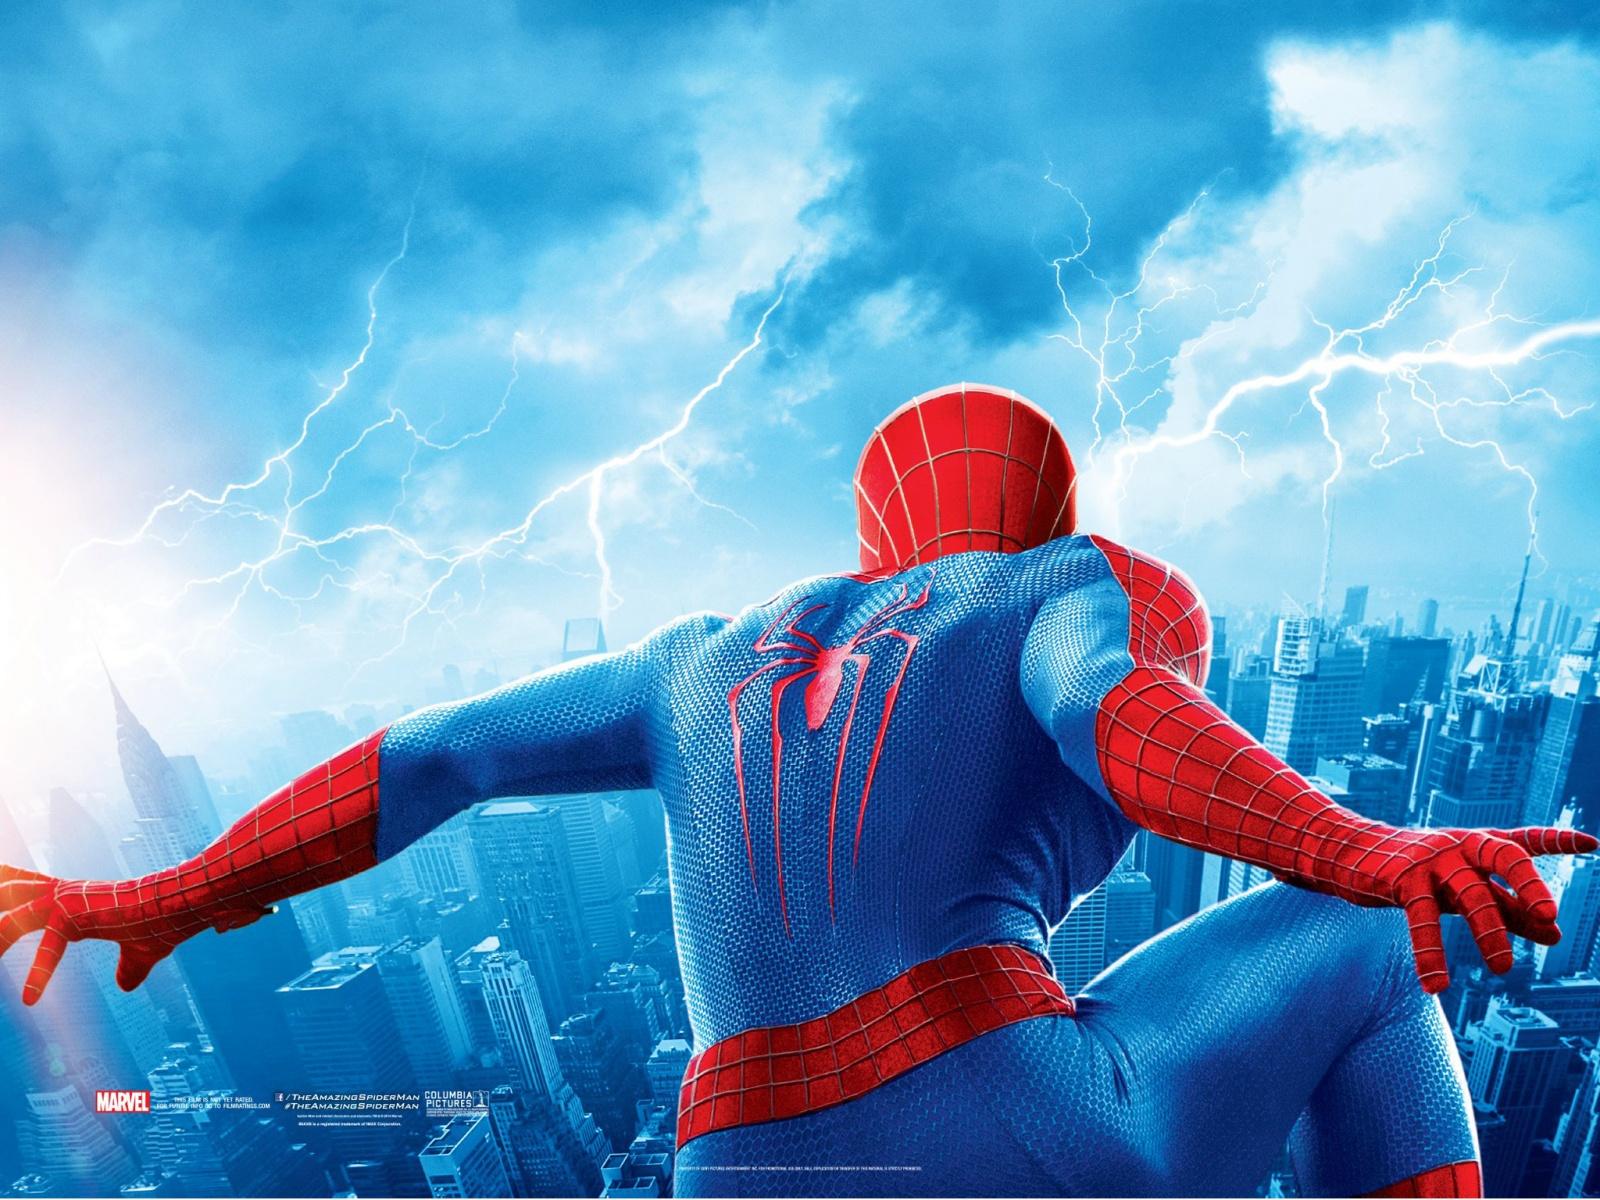 Hd wallpaper spiderman - 2014 The Amazing Spider Man 2 Wallpapers Hd Wallpapers